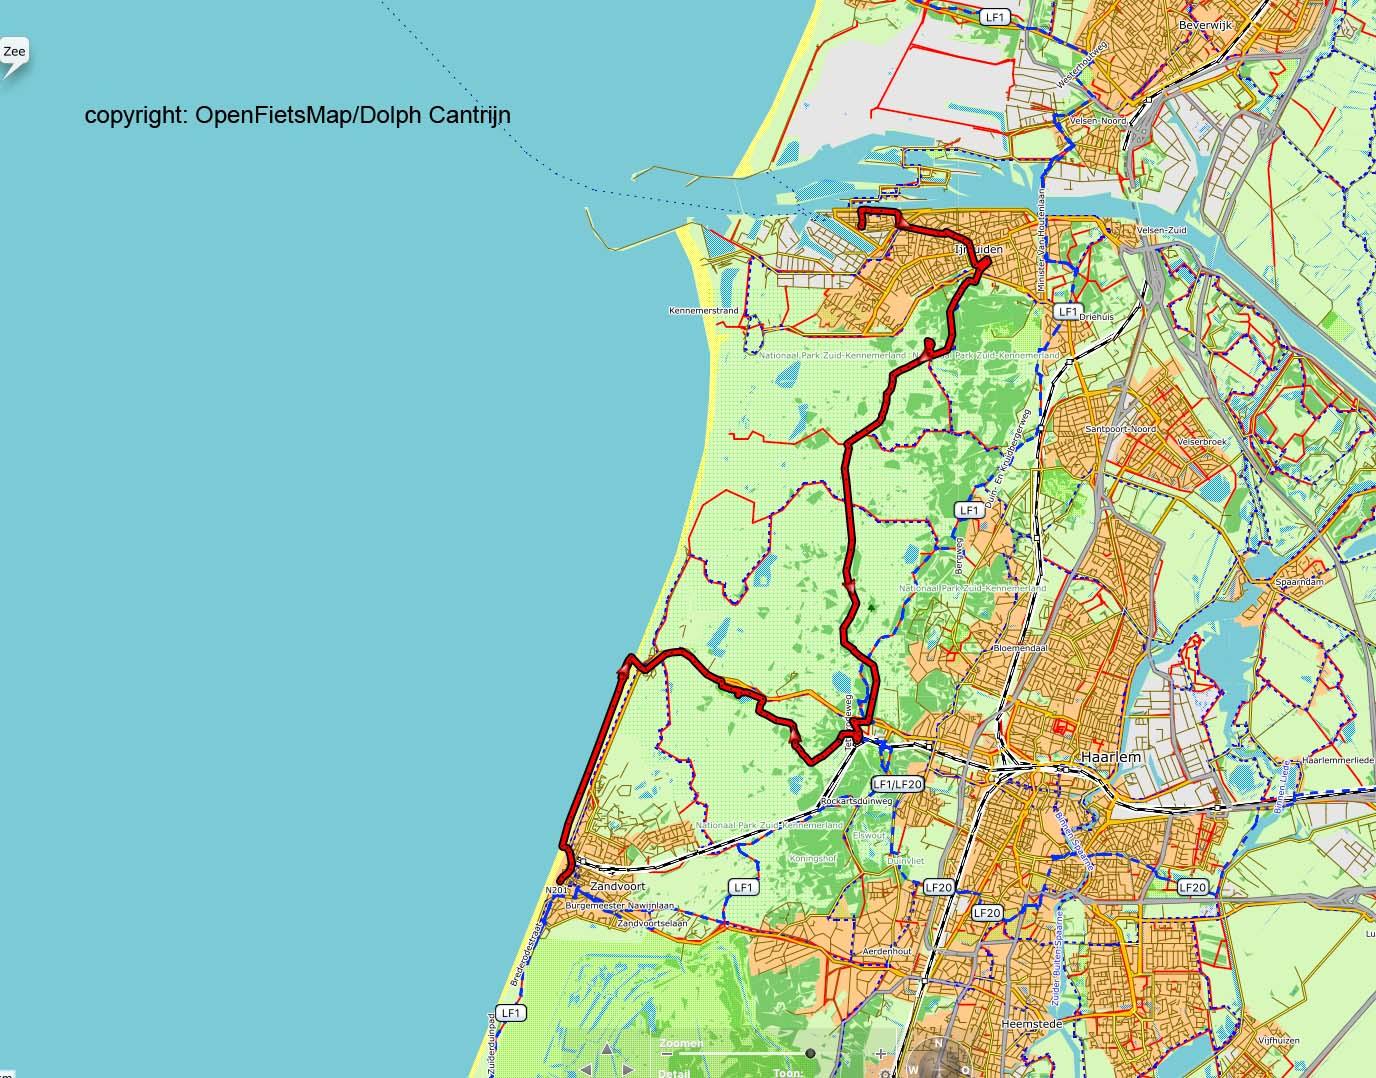 Dag 59 IJmuiden - Zandvoort